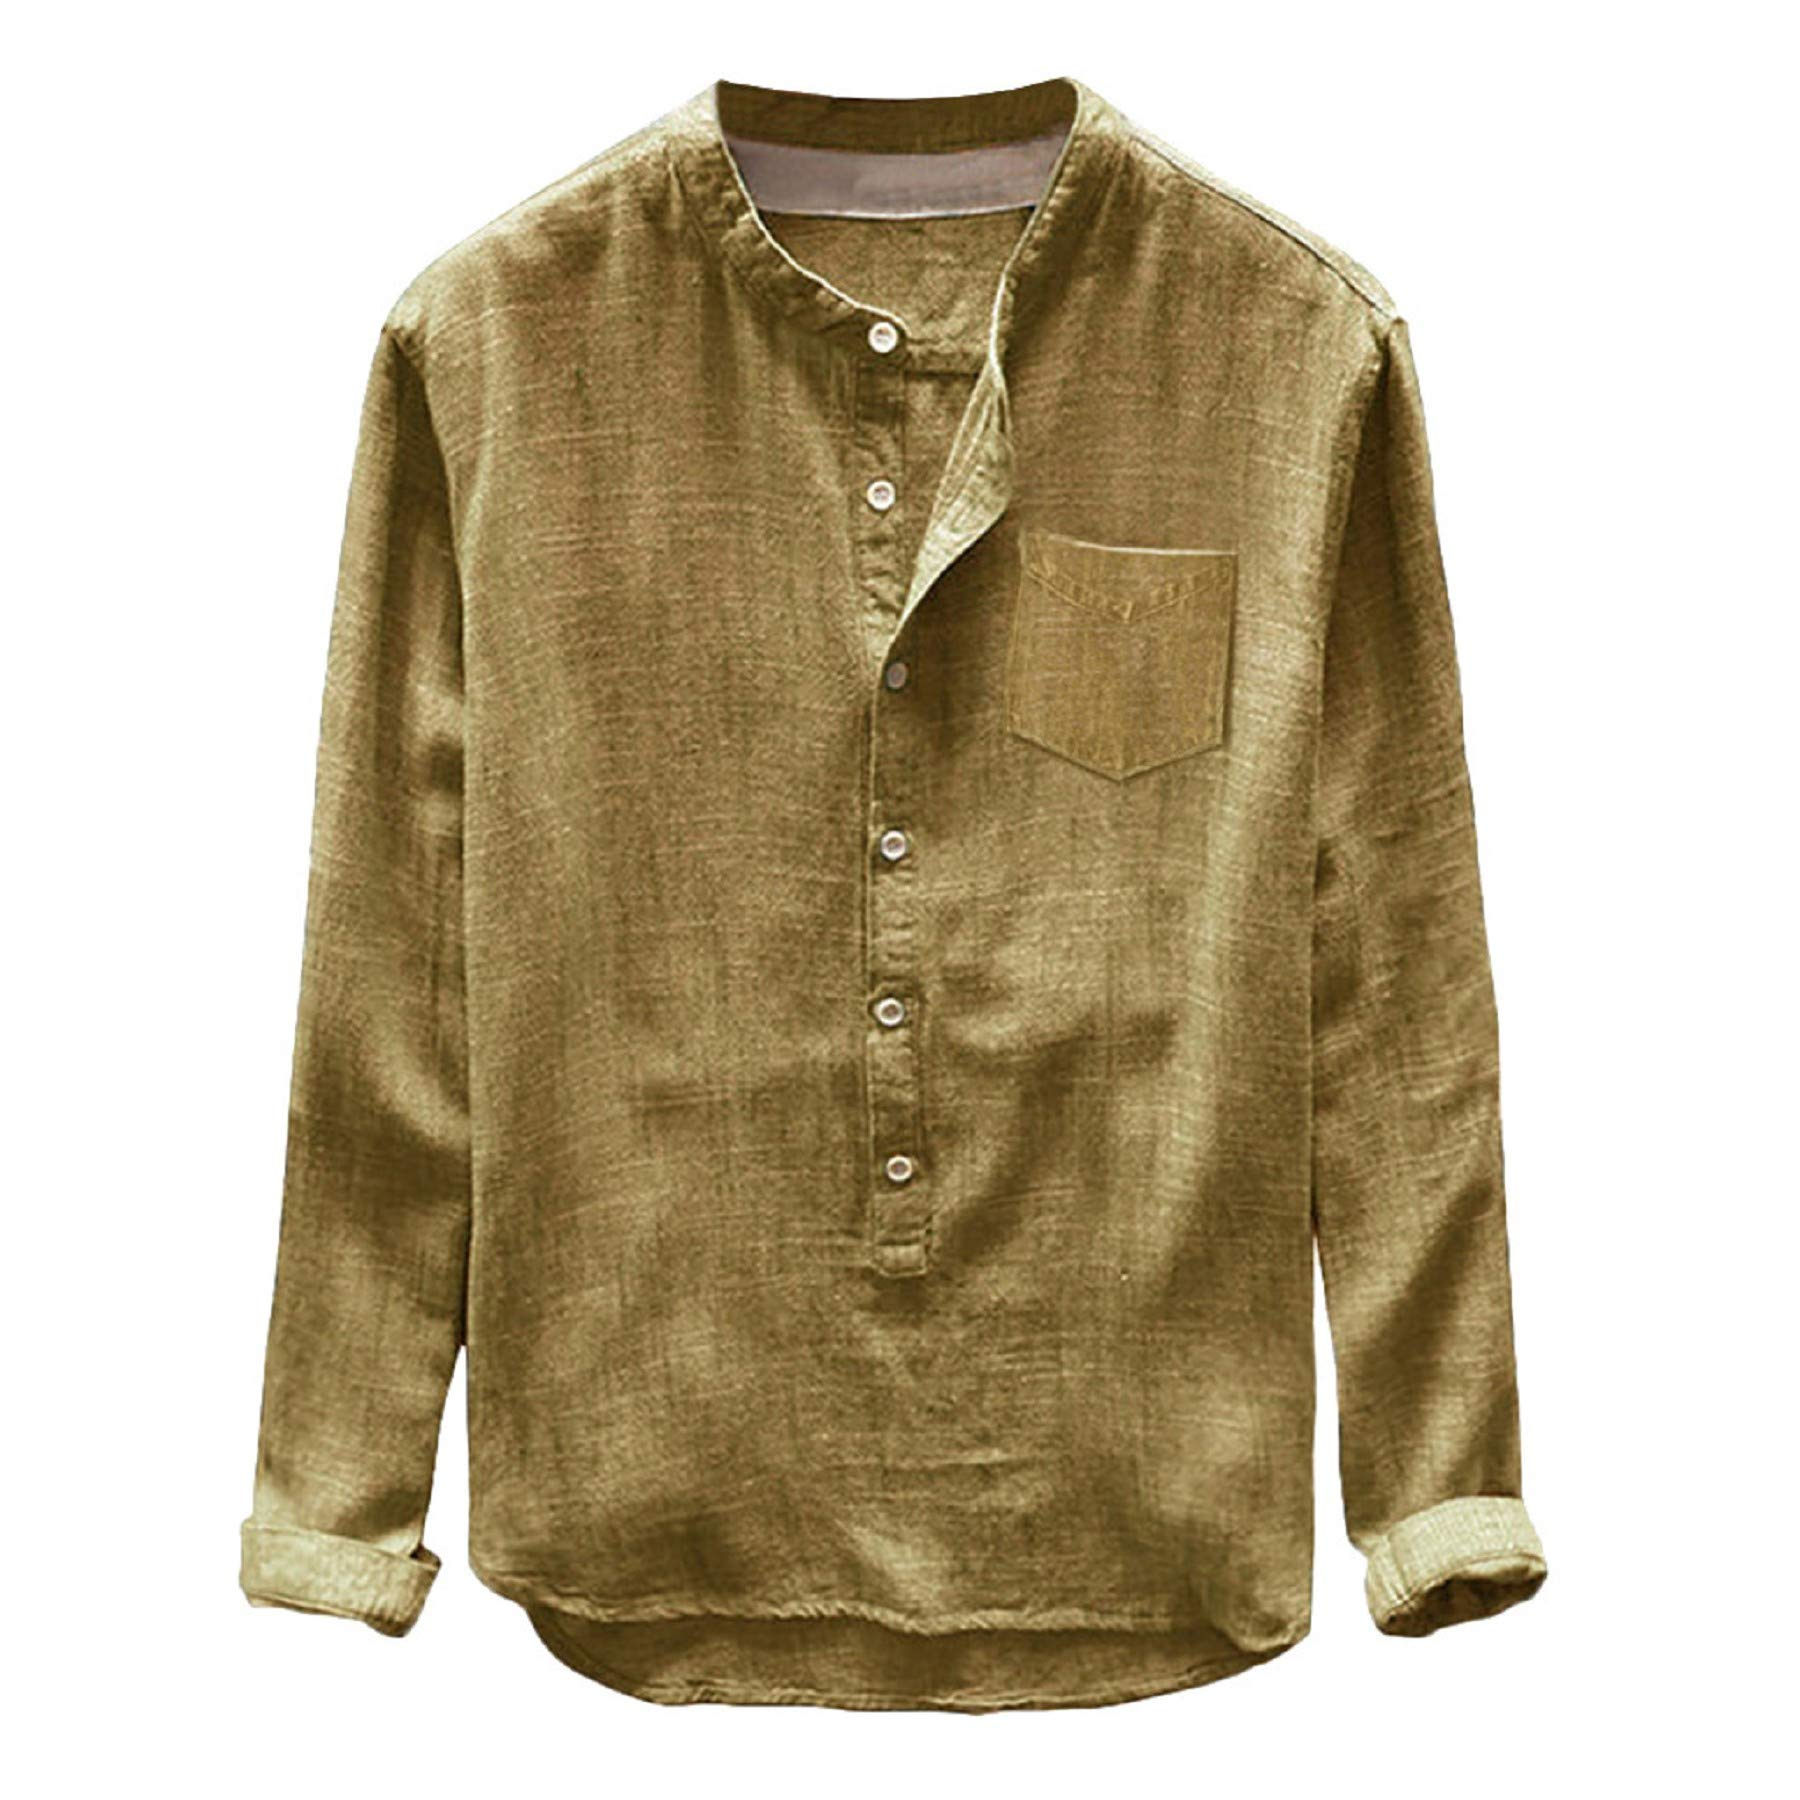 baskuwish Men's T-Shirt,Fashion Mens Autumn Summer Button Casual Linen Cotton Long Sleeve Top Blouse Boy Shirt Yellow